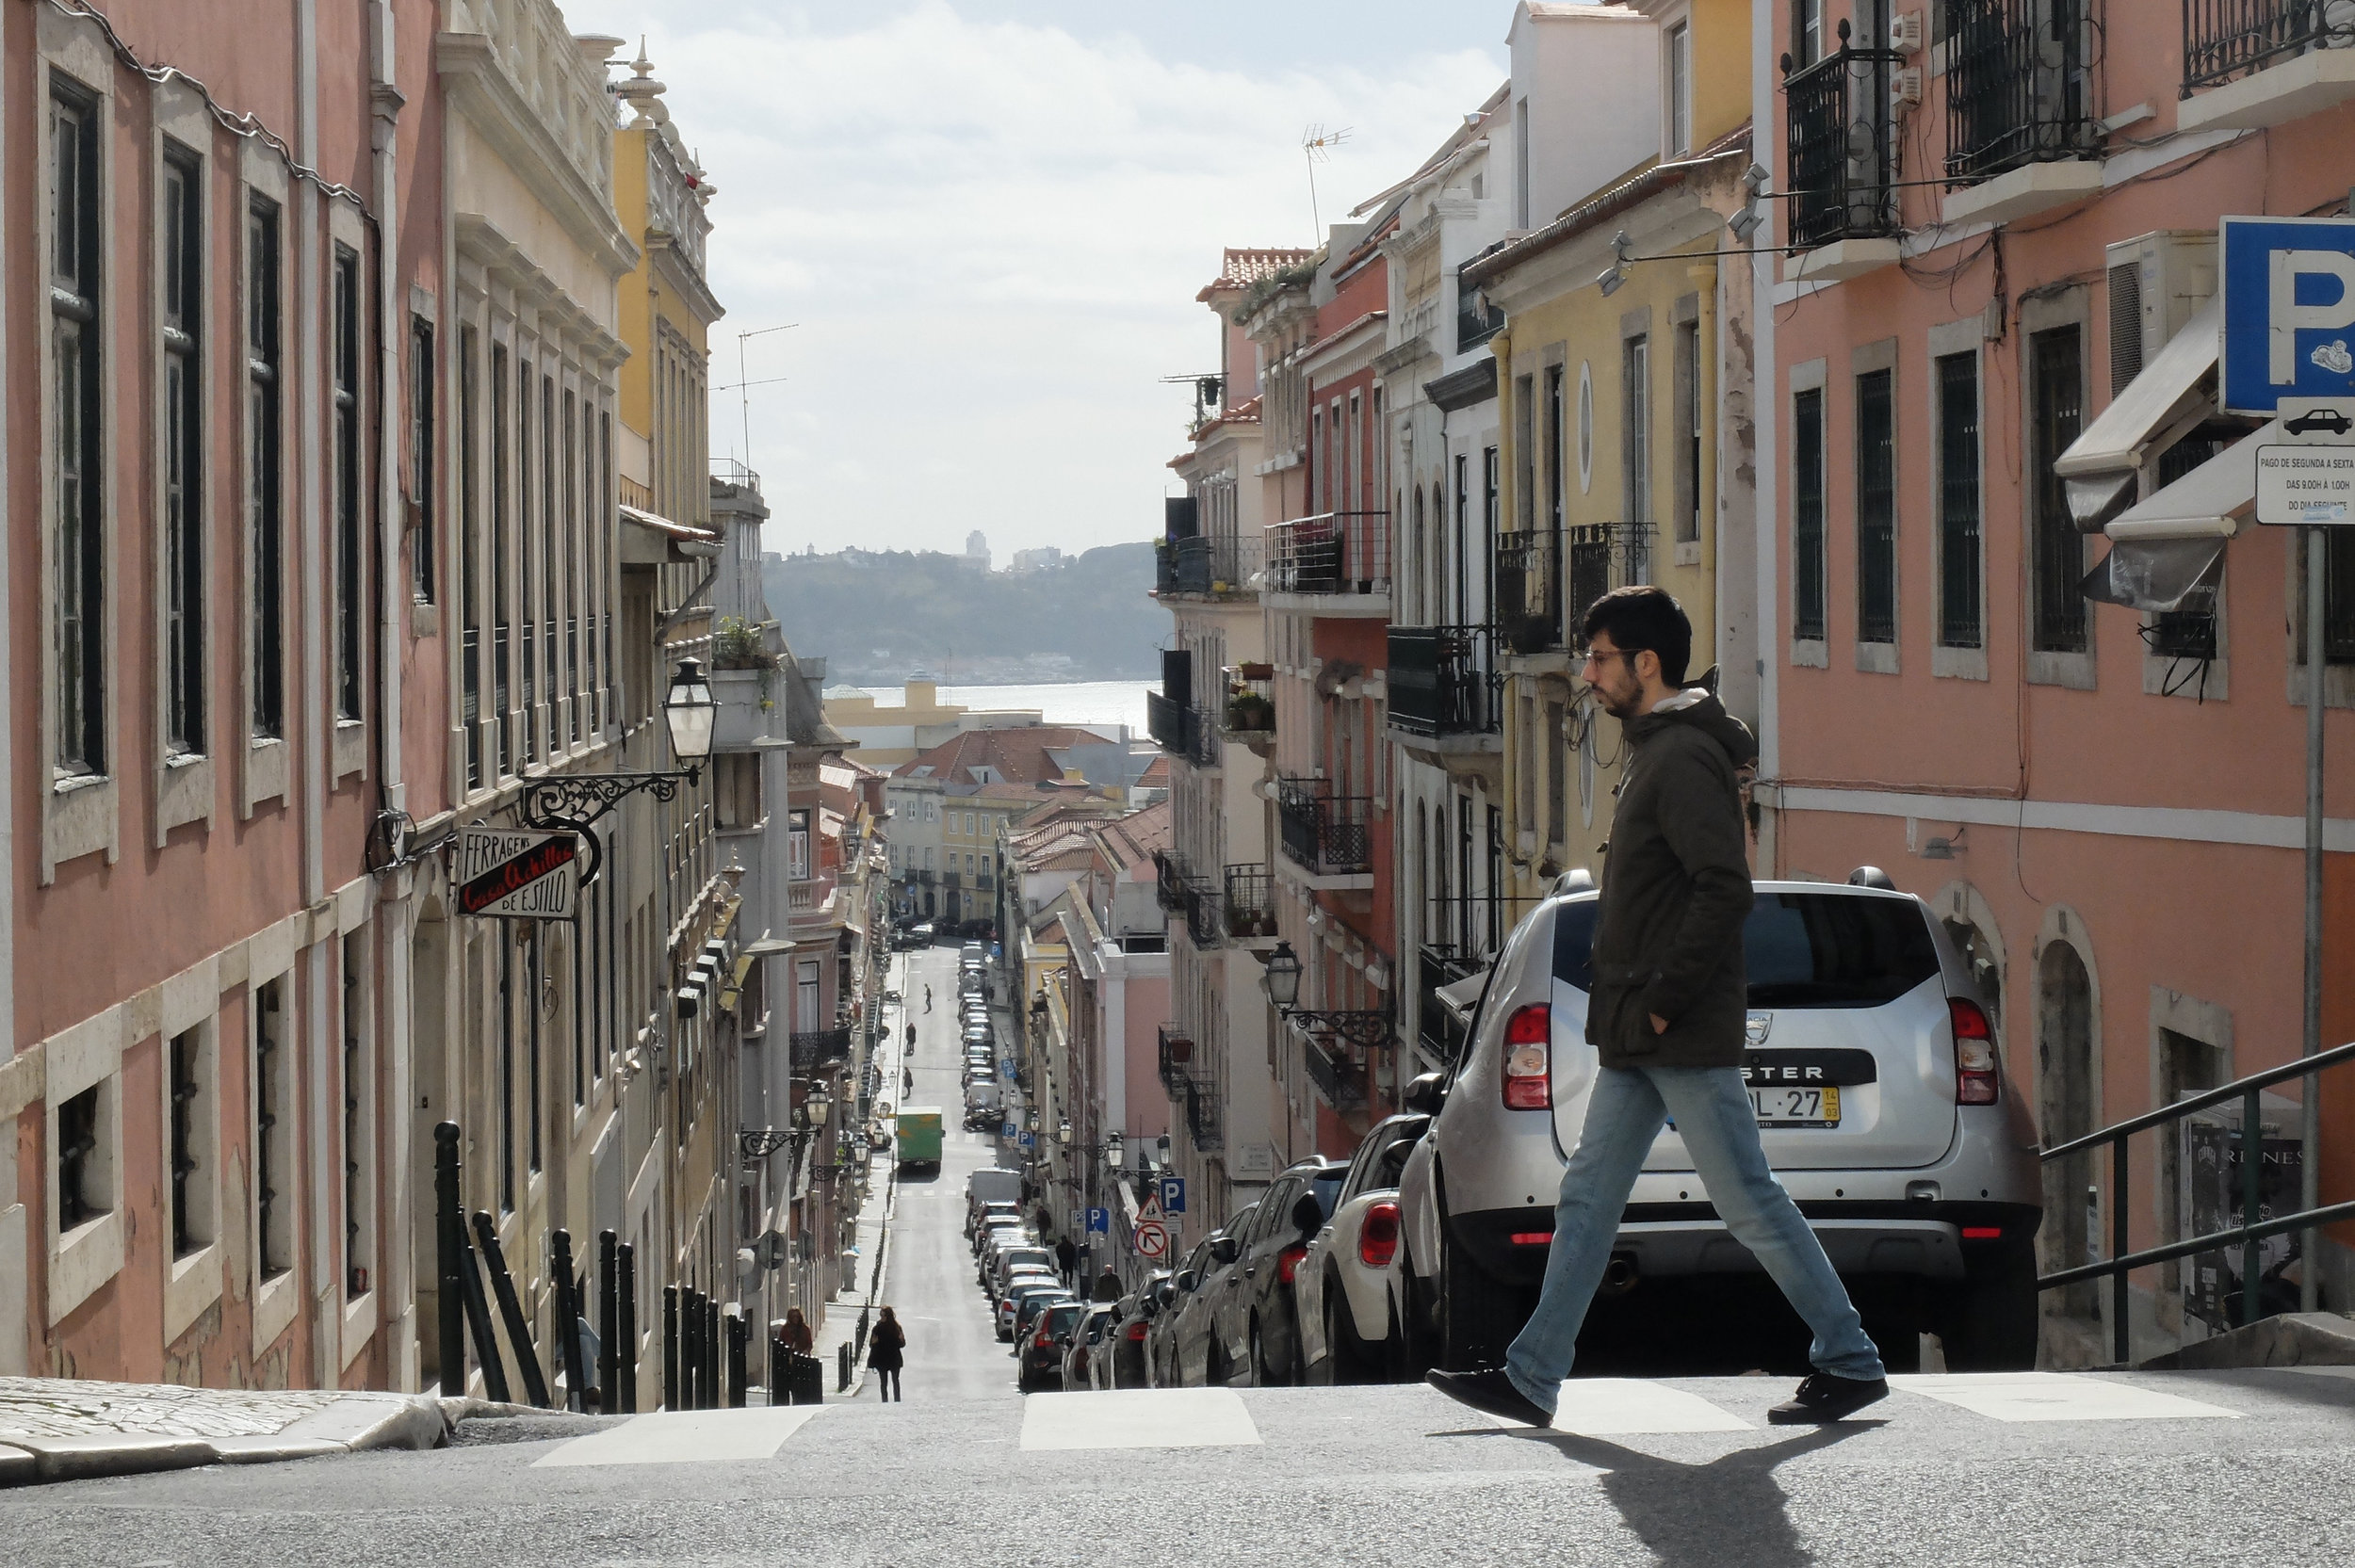 portugal014.jpg